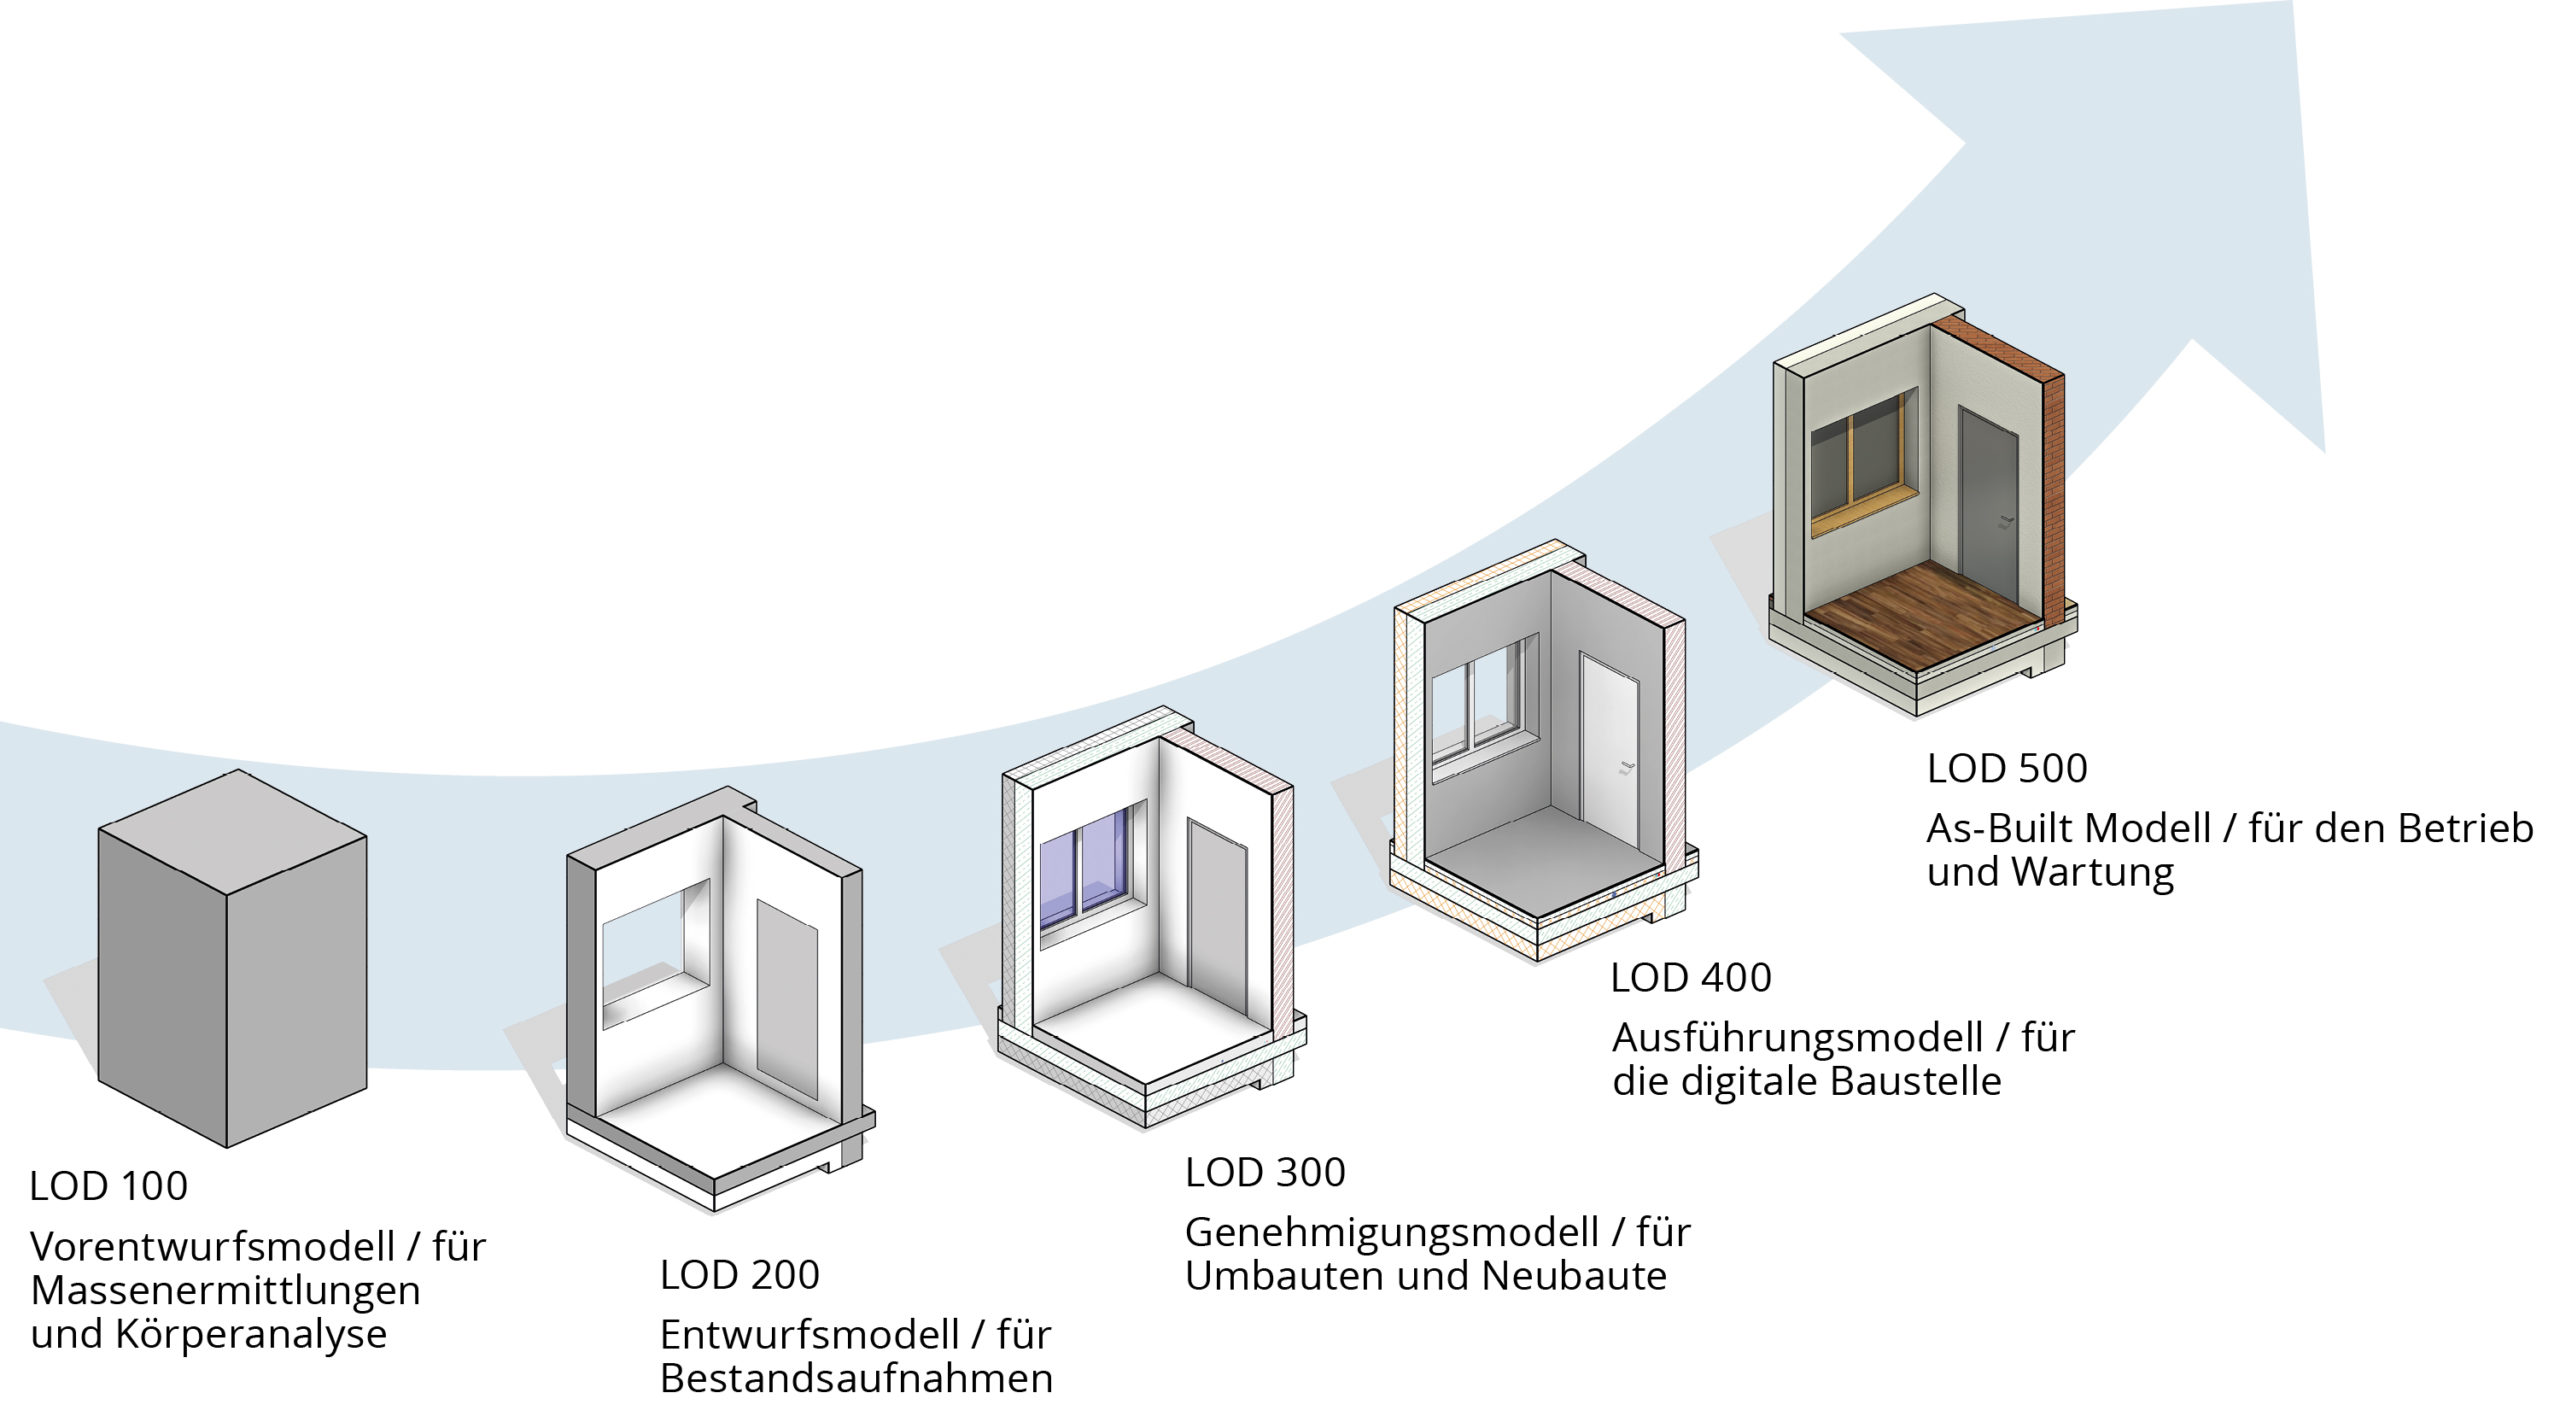 LOD 100-500 Darstellung